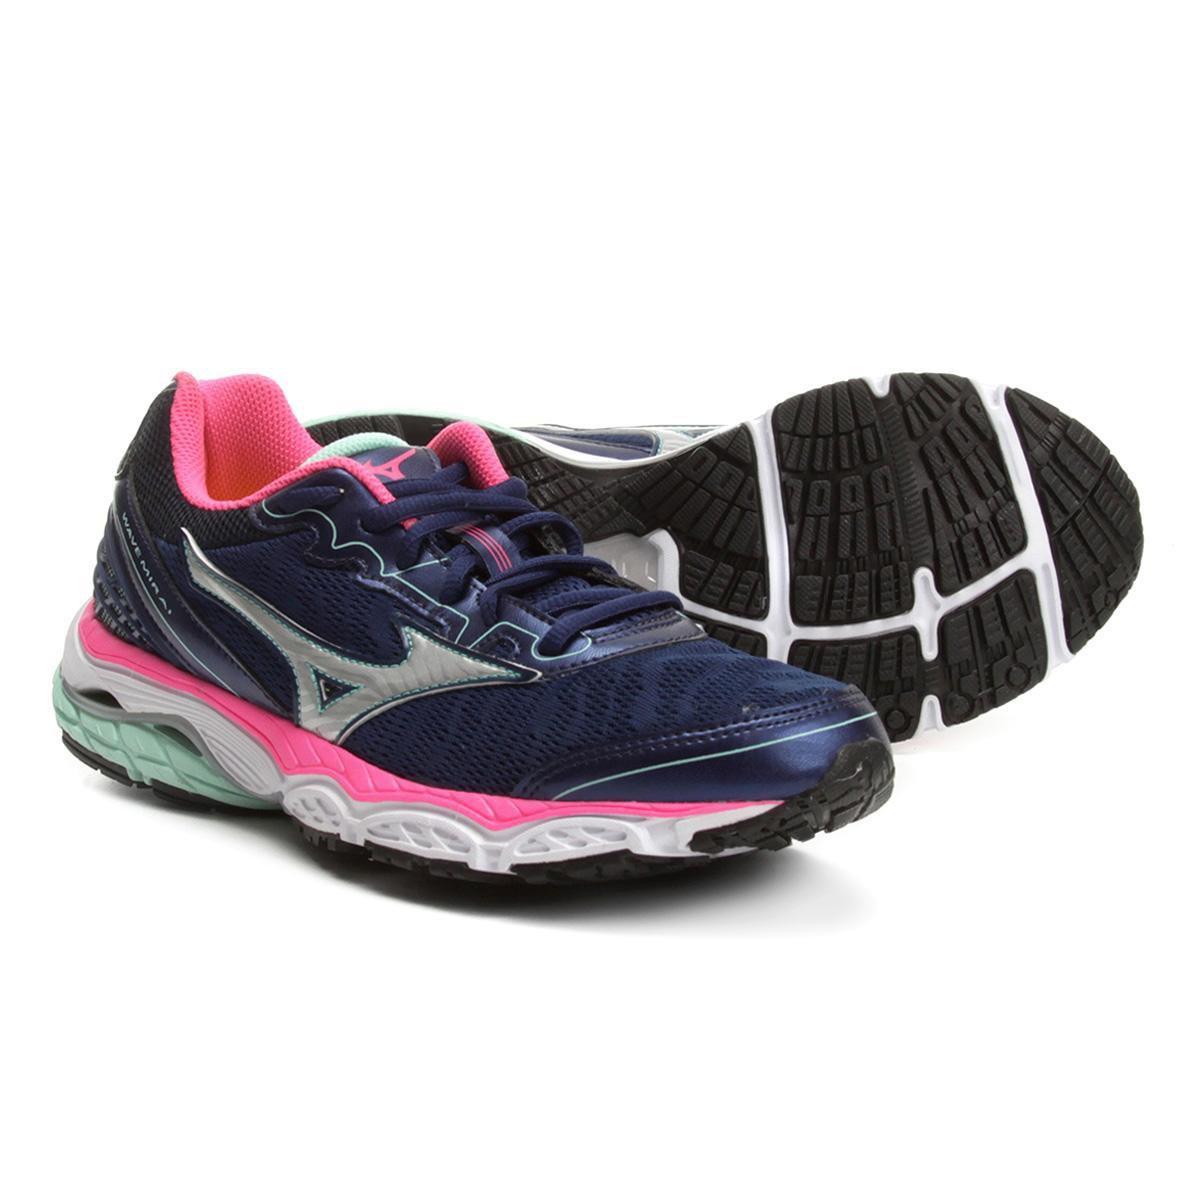 netshoes tenis feminino mizuno wave original